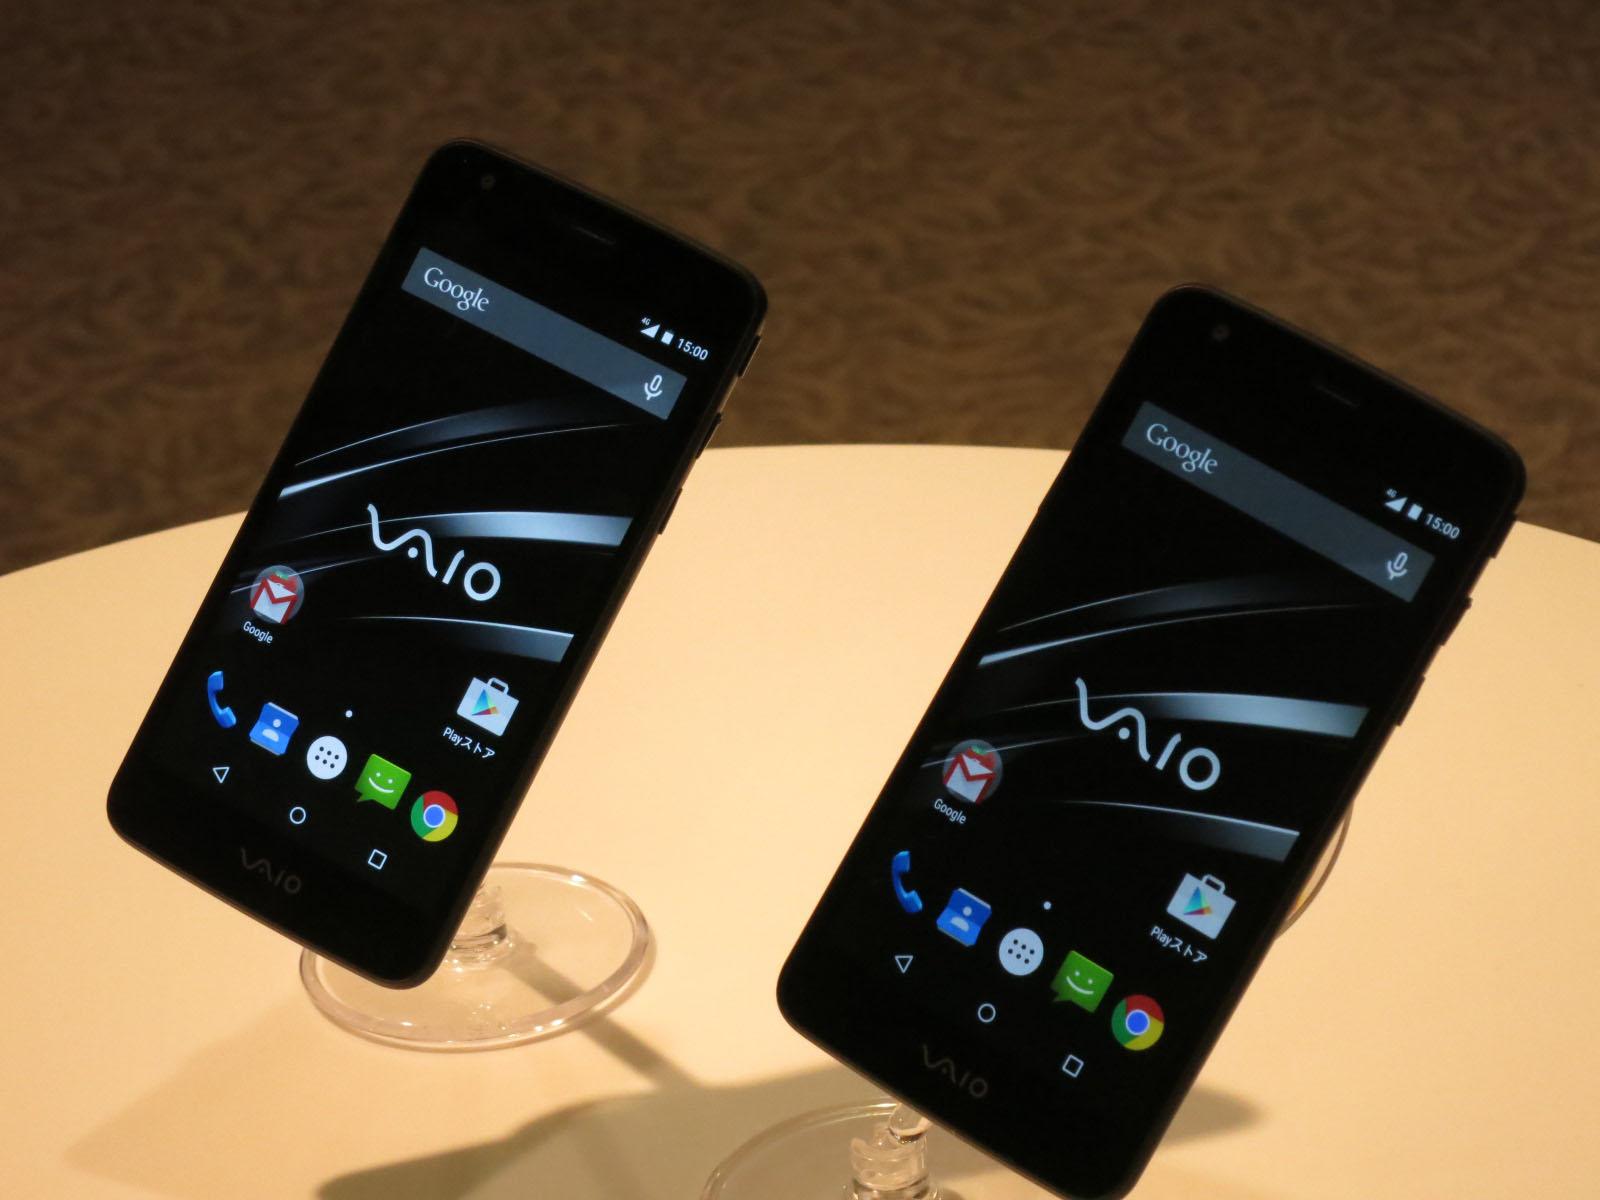 vaio phone - VAIO Phone chỉ là bản sao của Panasonic Eluga G2